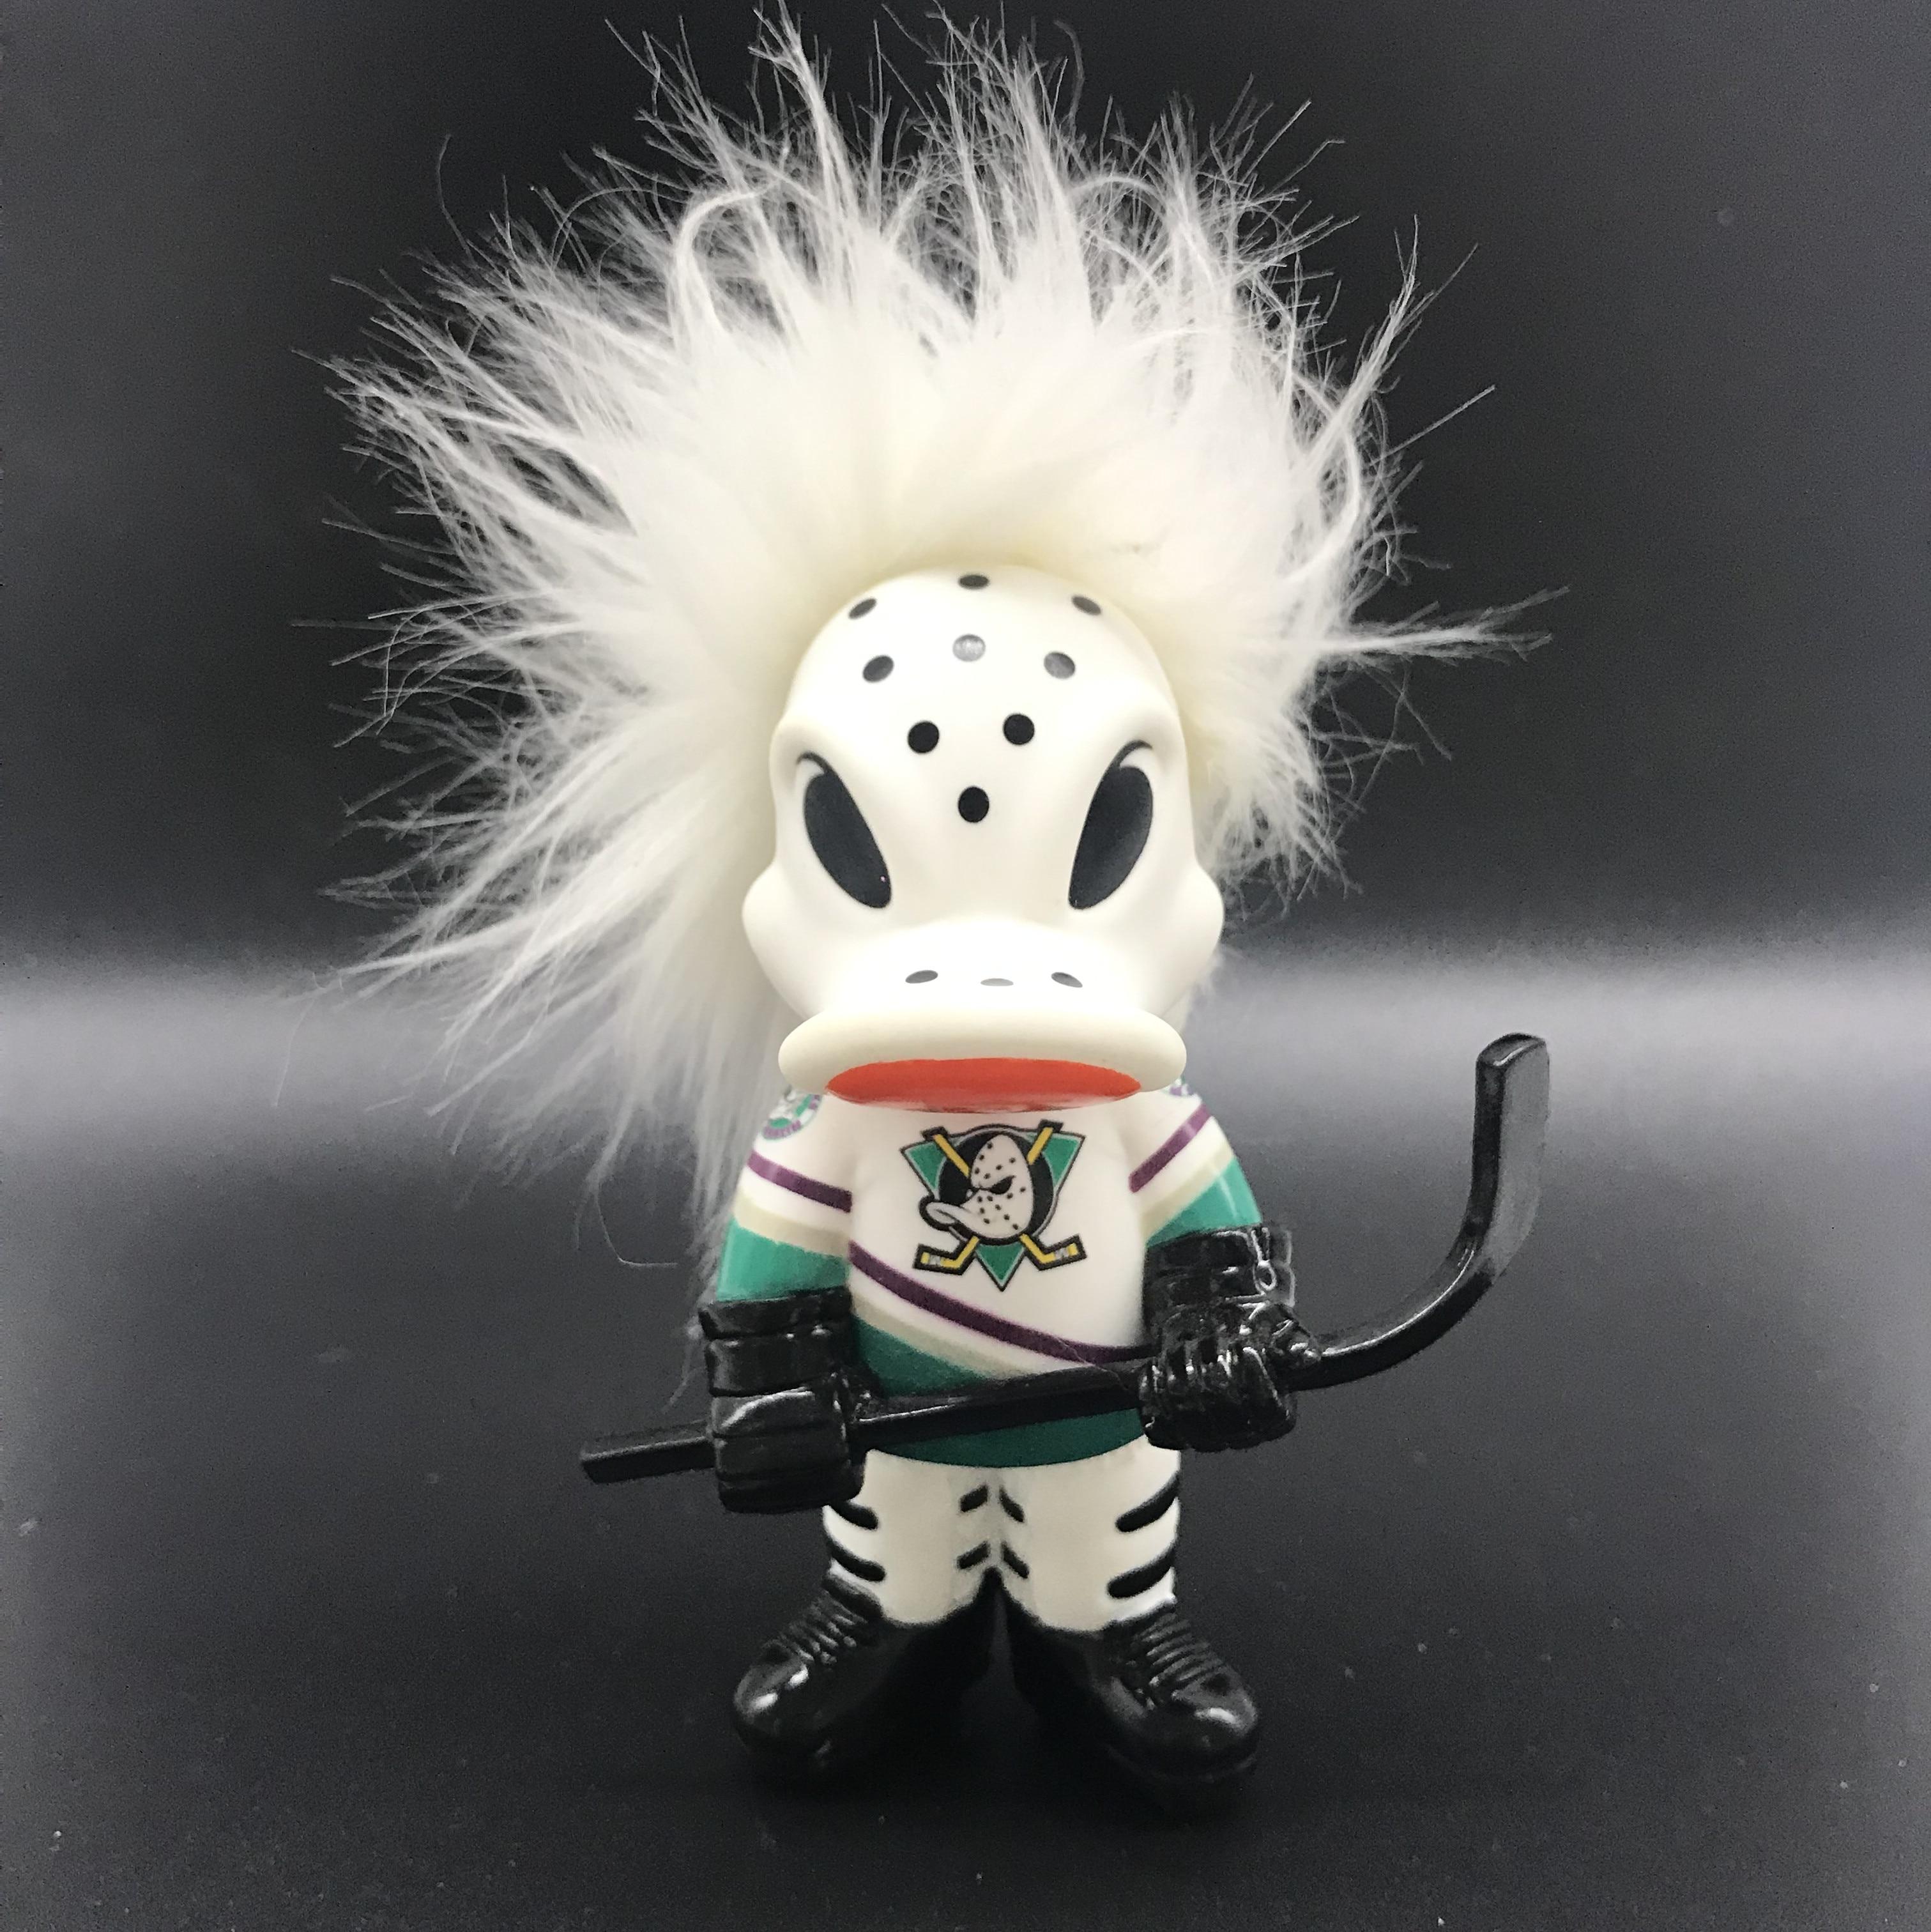 AOSST WILD WING troll doll model nhl Anaheim Ducks fashion toy souvenier nib collector NO BOX